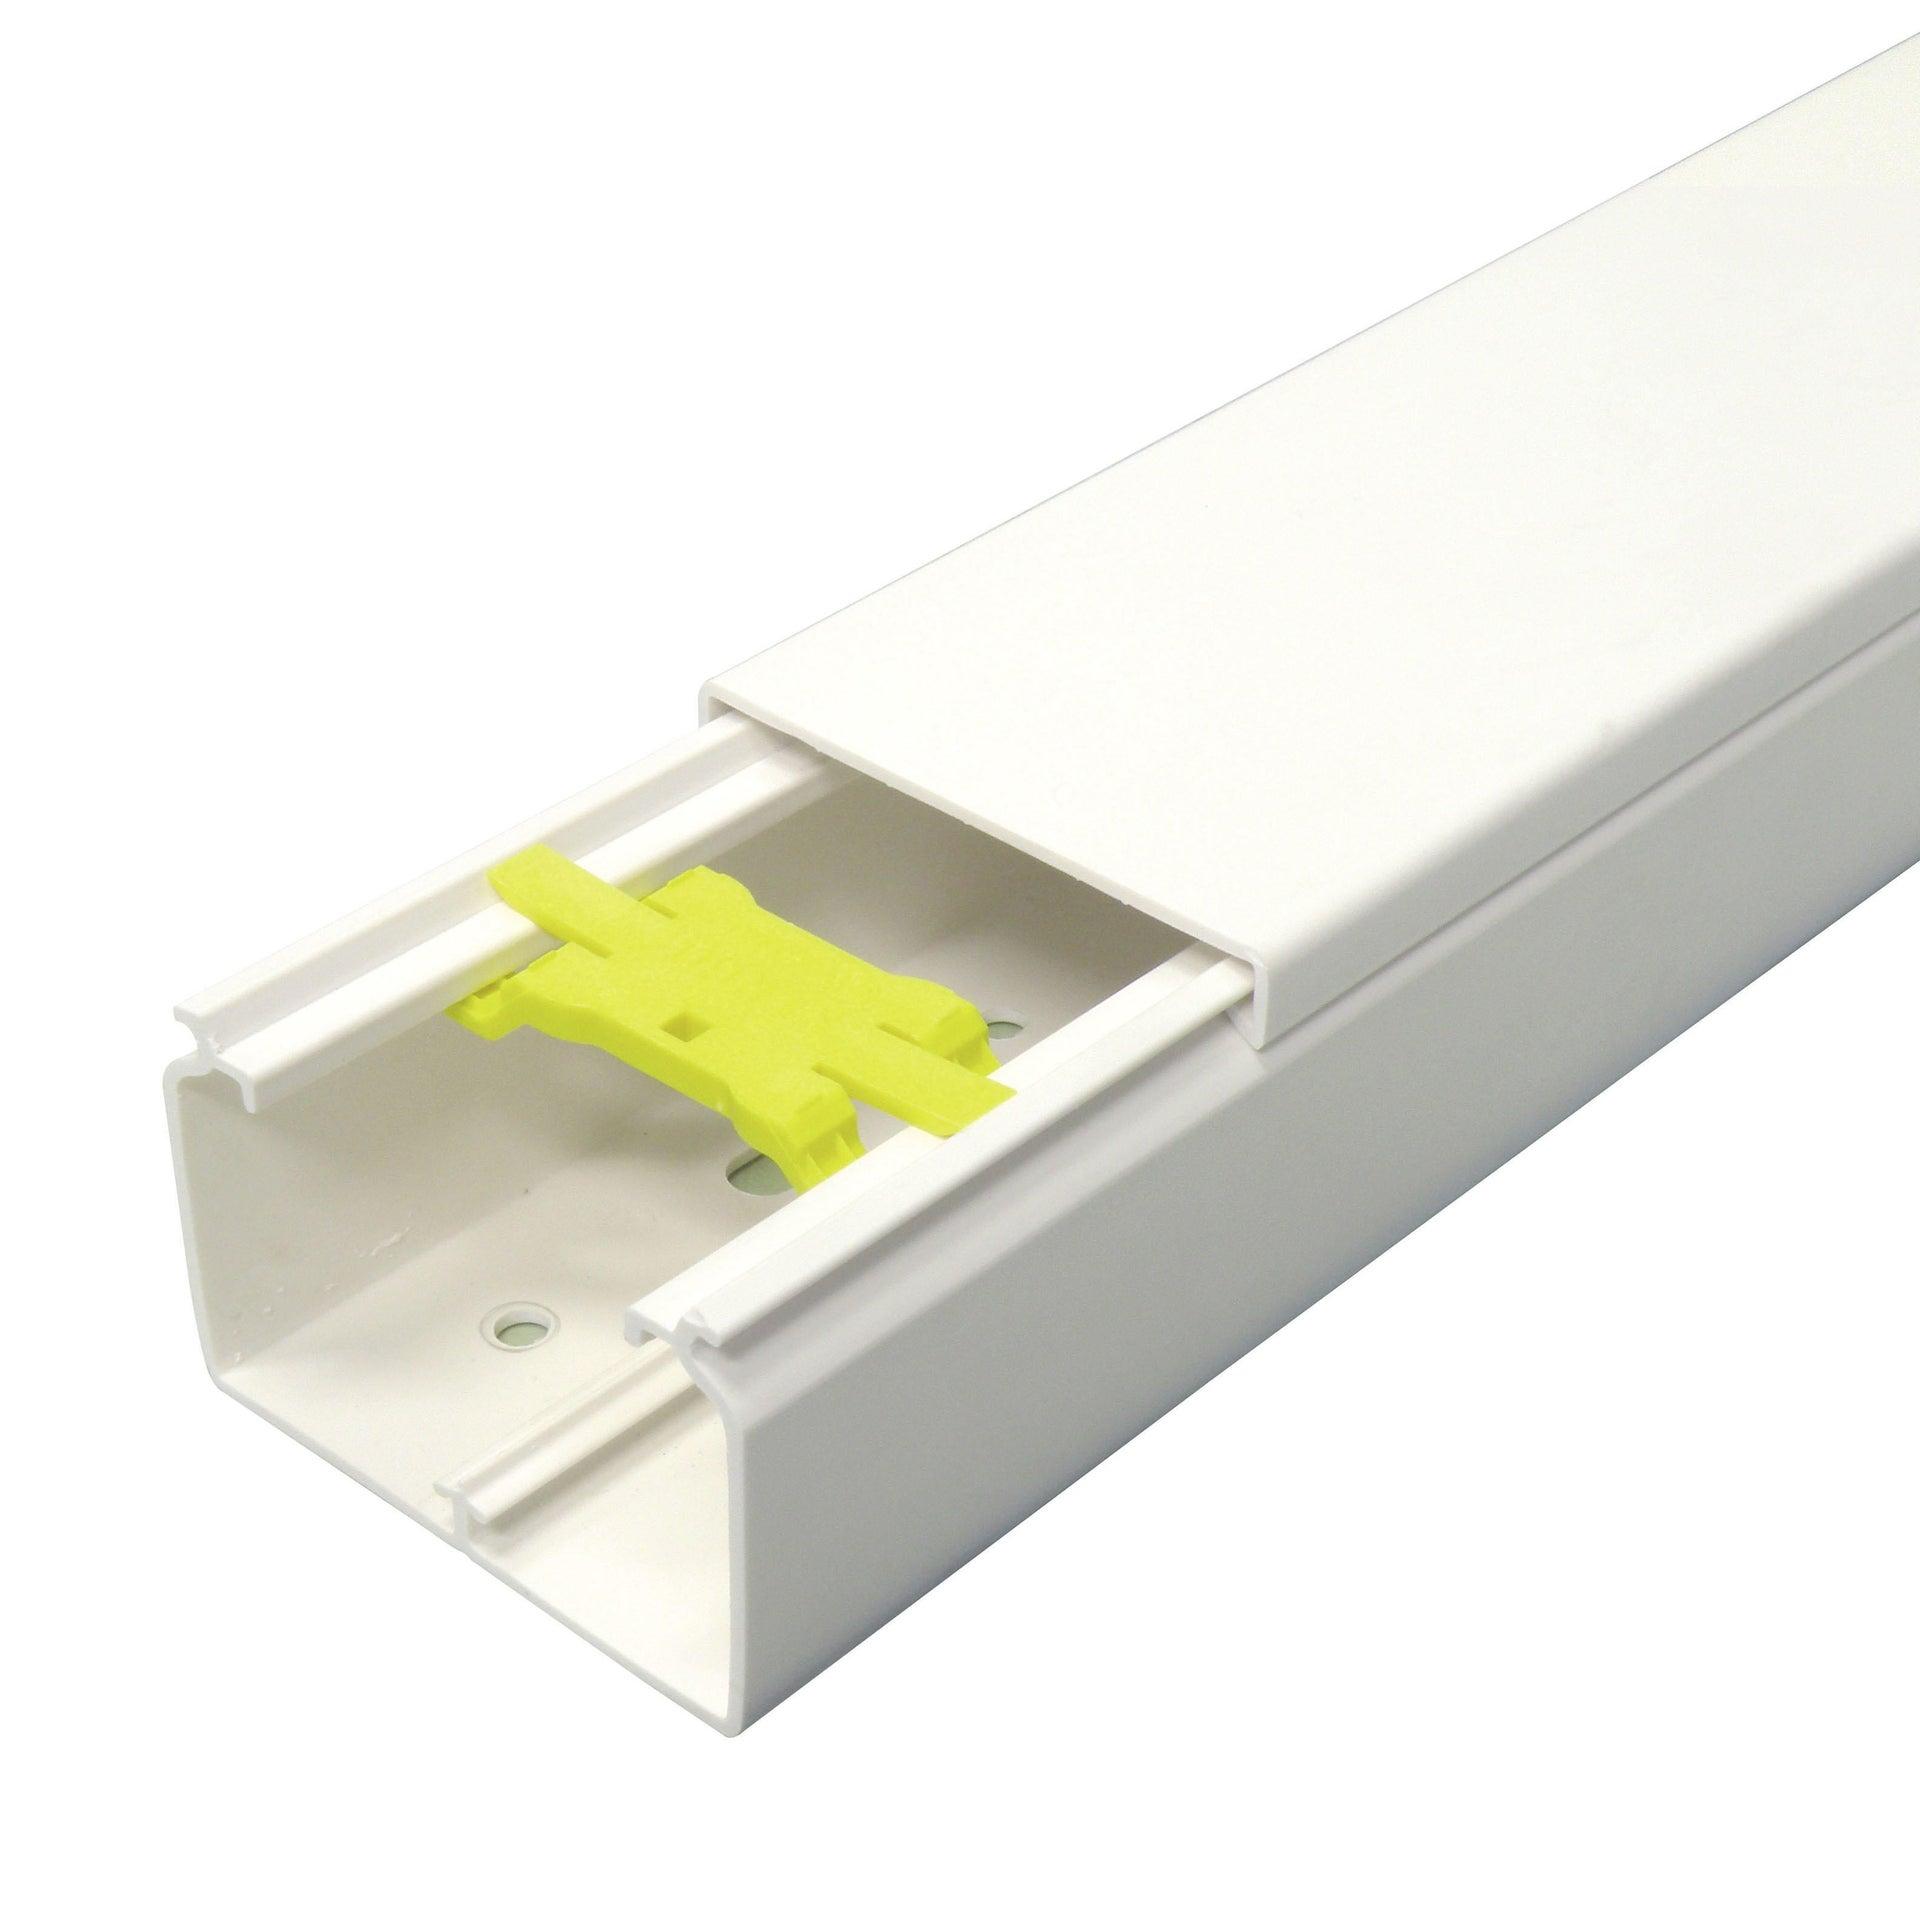 Canalina gtl 200 x 4 x 6 cm bianco